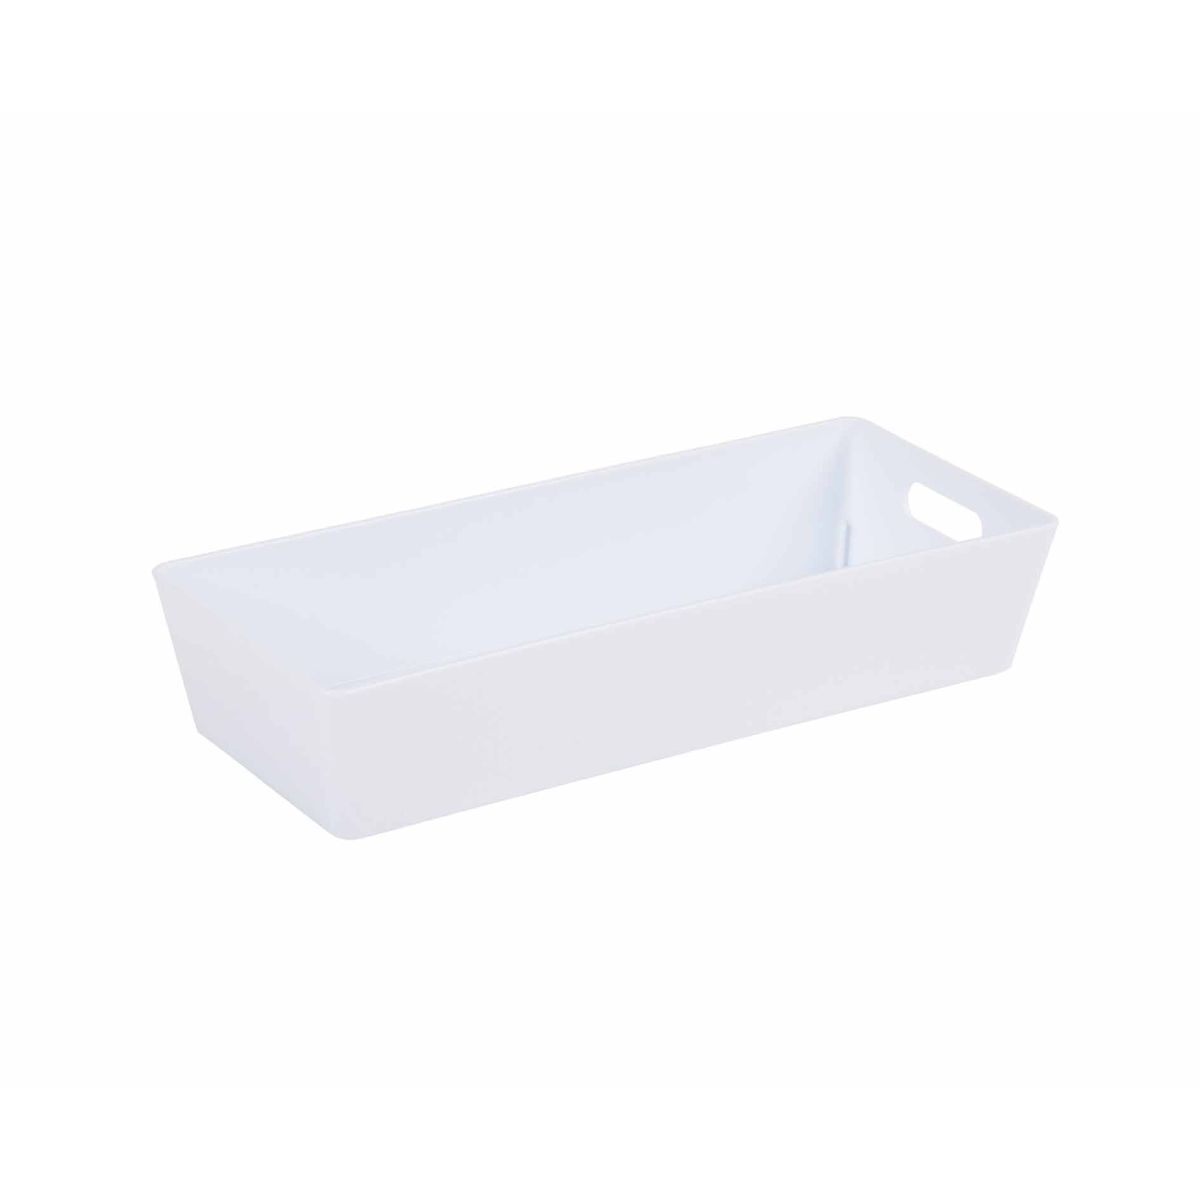 Wham Studio Rectangular Basket 2.01 White